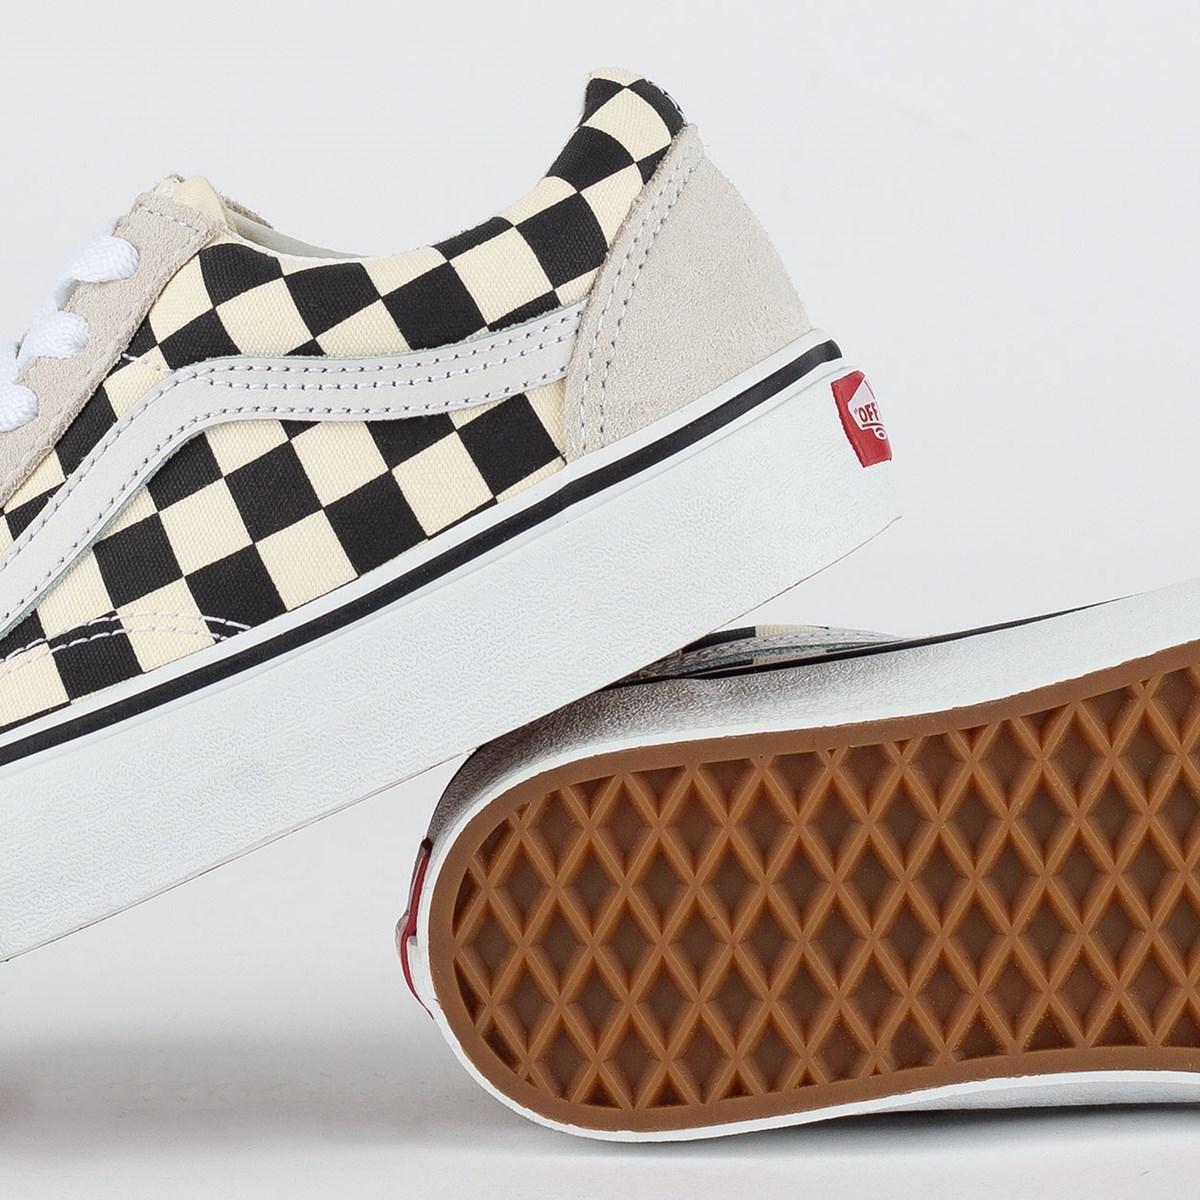 Tênis Vans Old Skool Checkerboard White Black VN0A38G127K